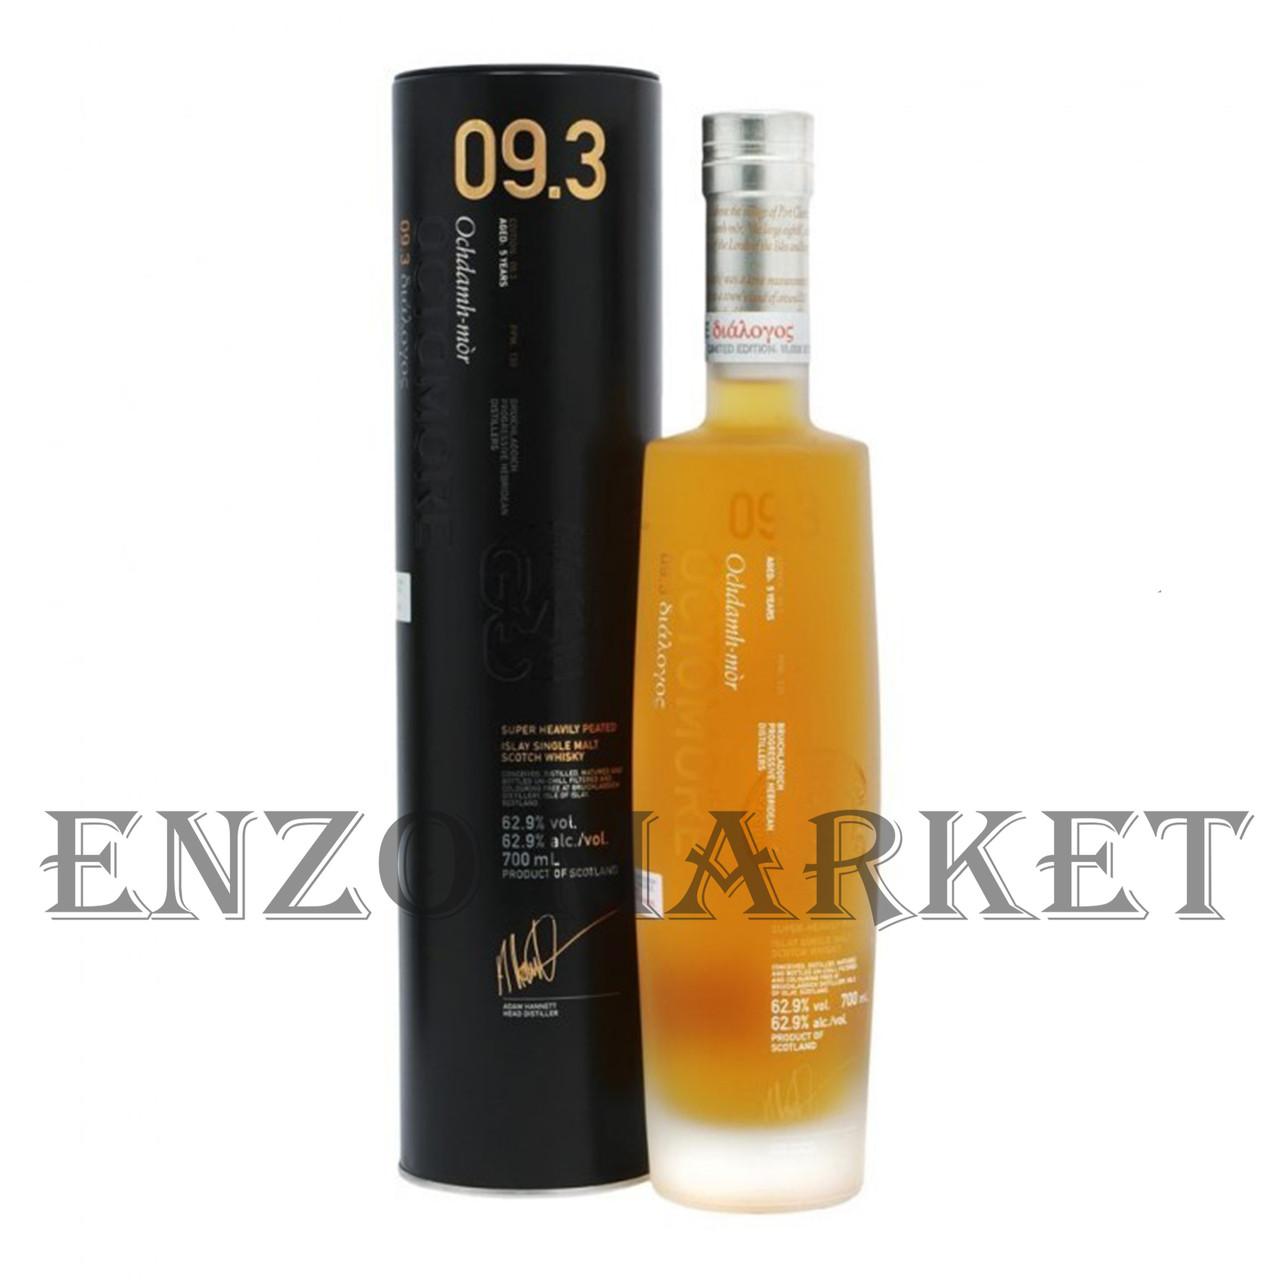 Виски Bruichladdich Octomore Scottish Barley 09.3 (Брукладди Октомор Скотиш Барли) 62.9%, 0,7 литра